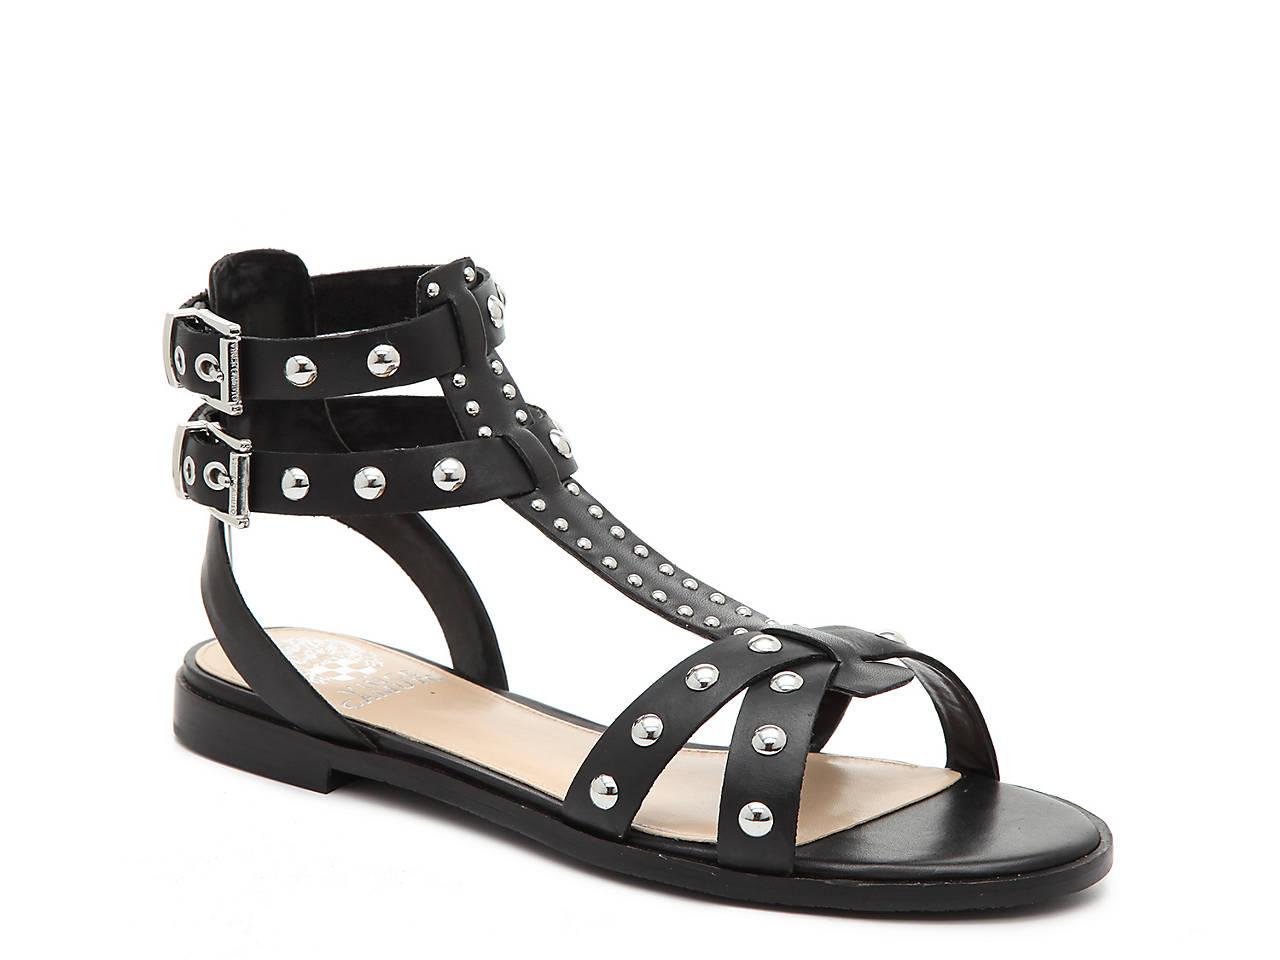 5c569d2e0f4 Vince Camuto Taneli Gladiator Sandal Women s Shoes